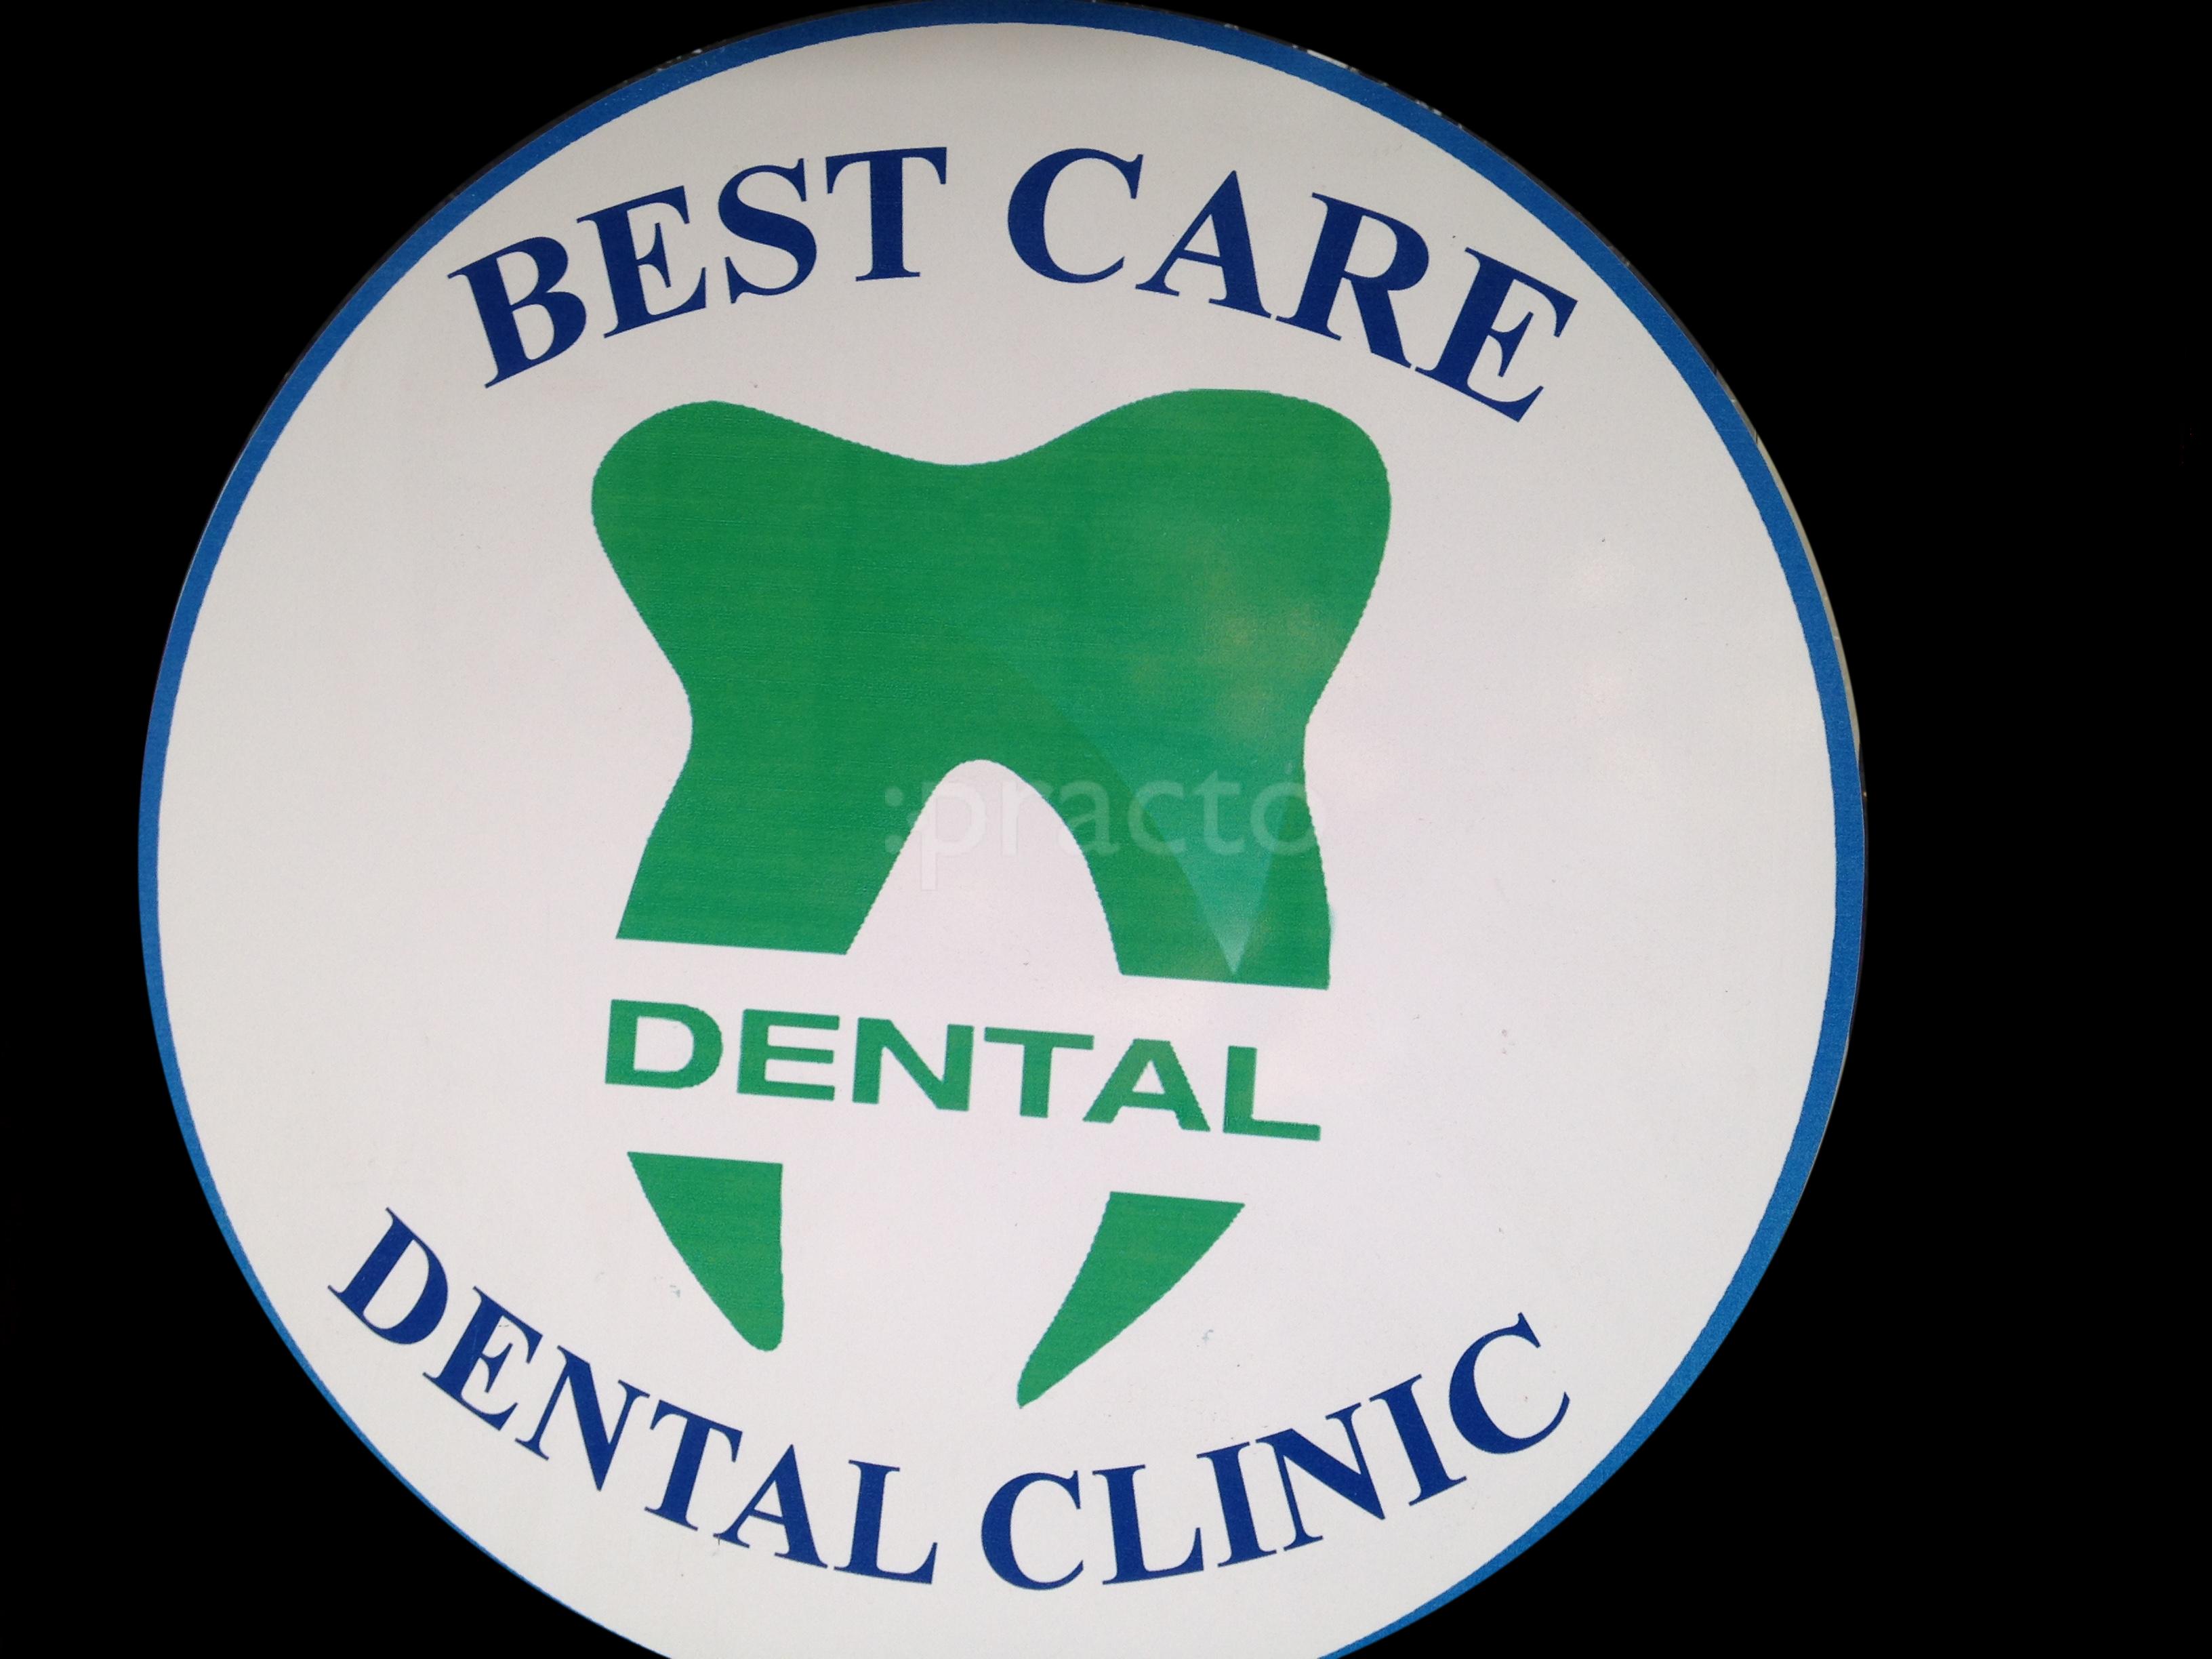 Best Care Dental Clinic